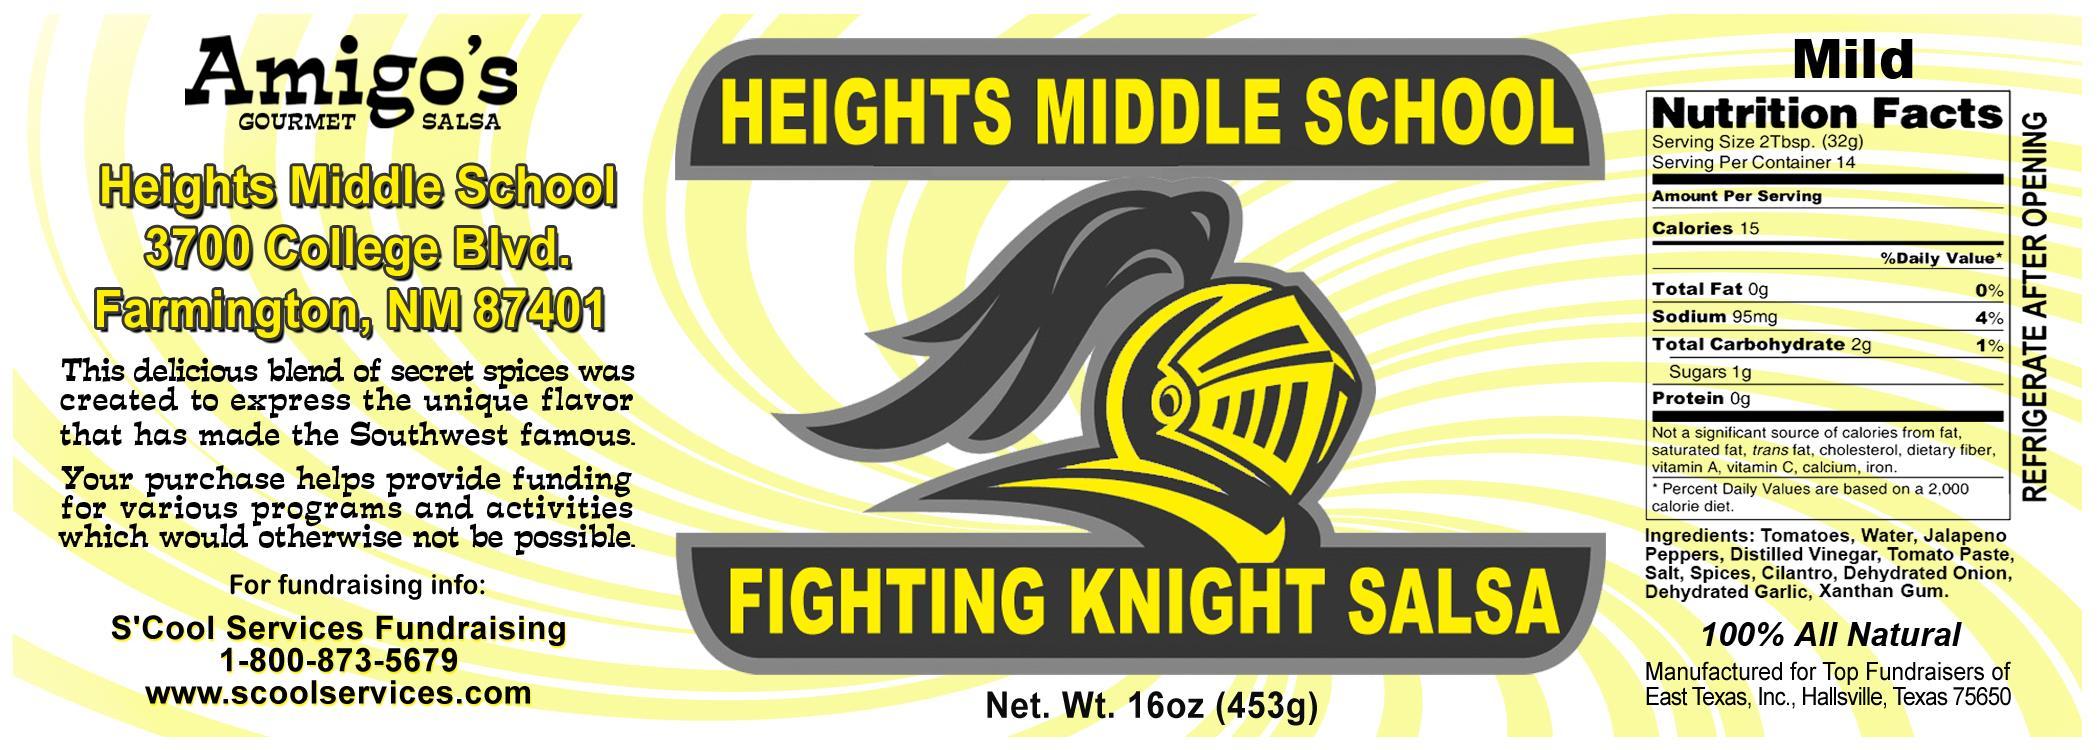 Heights Middle School Jar MILD.jpg